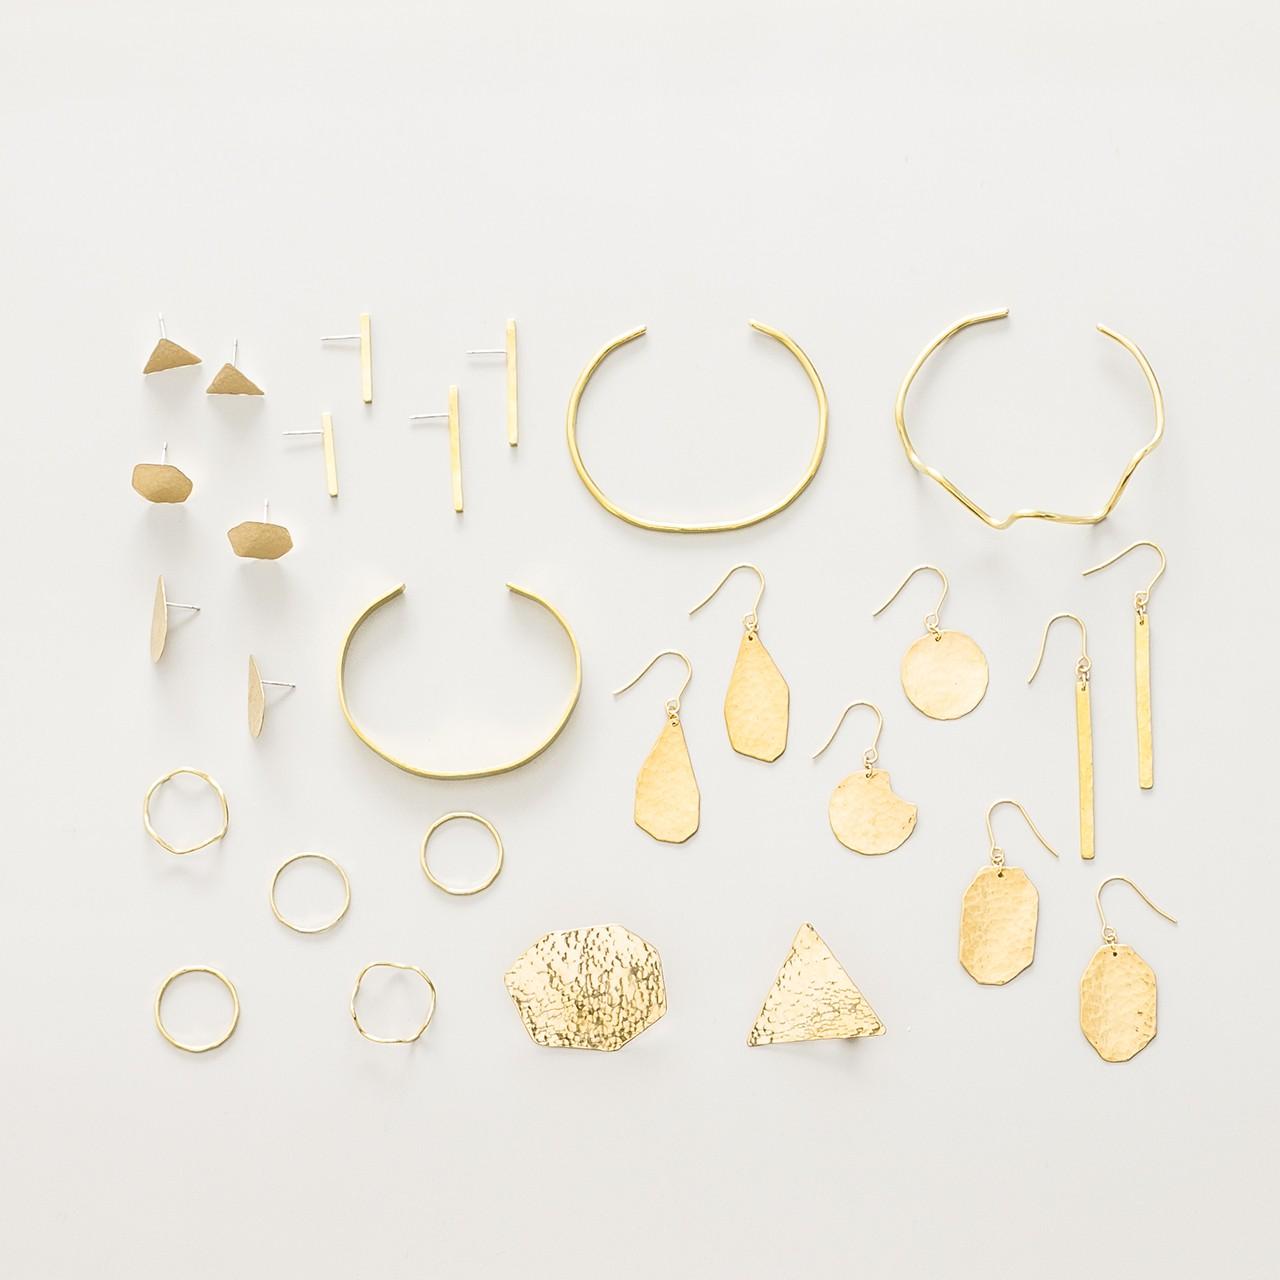 brass jewlry series